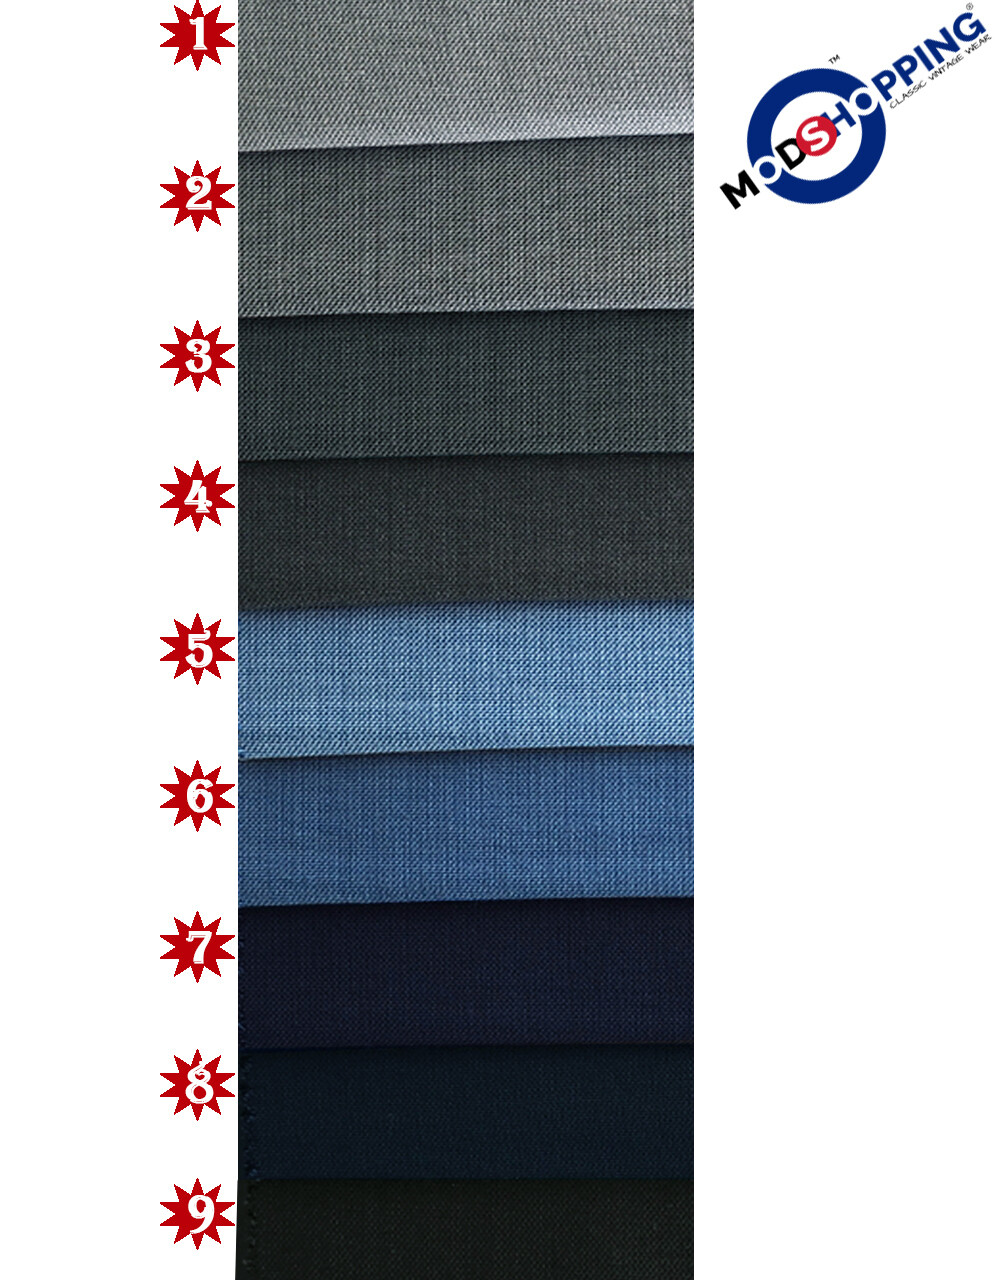 Custom 2 Piece Modshopping Tailored Plain Color Suit